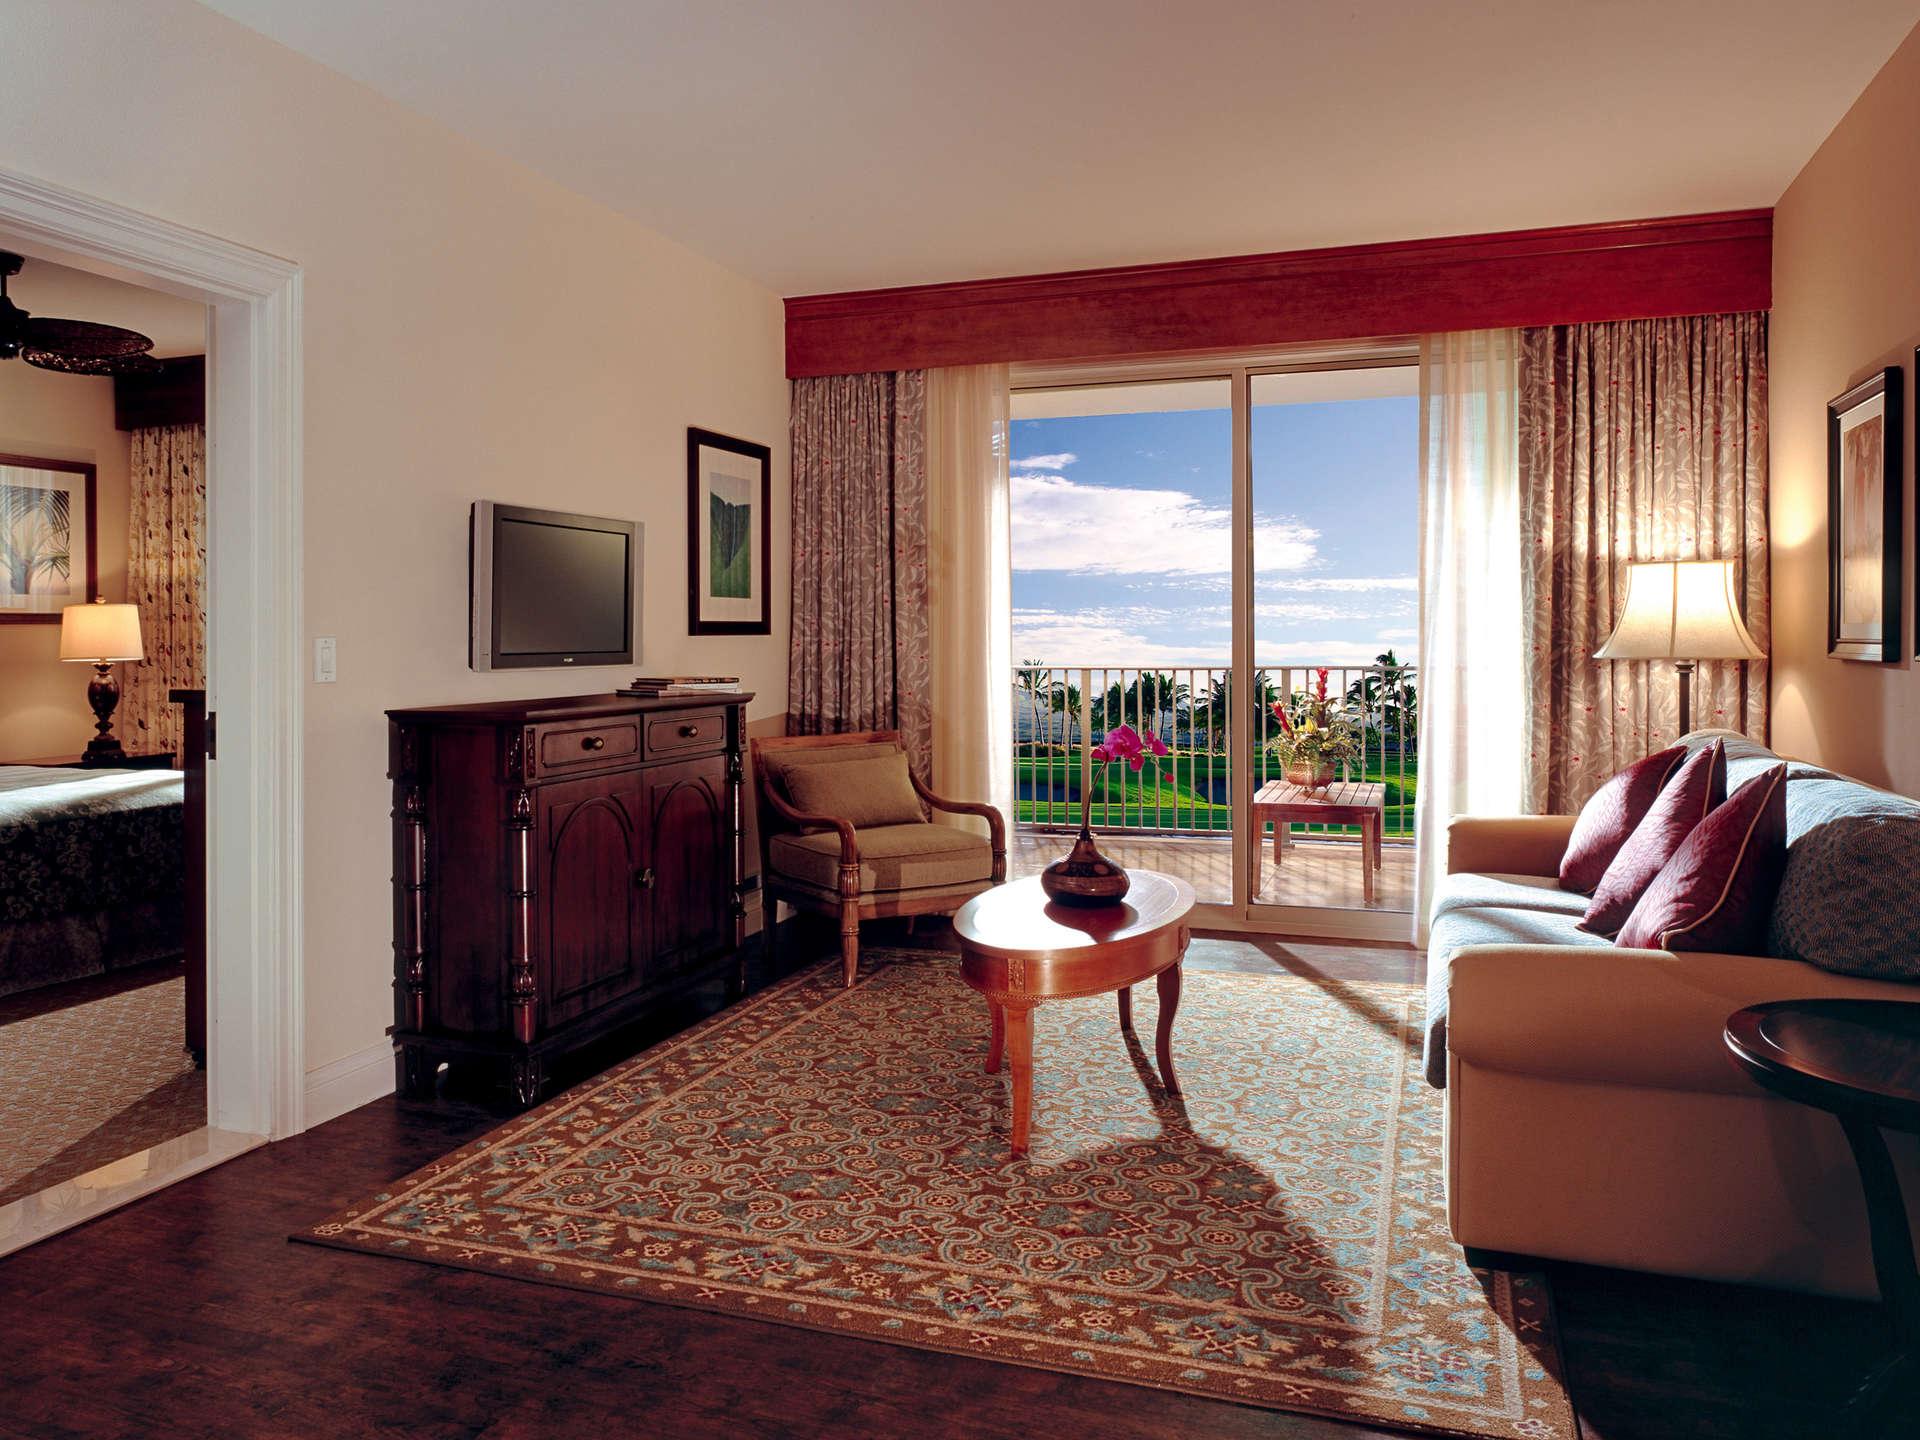 Luxury vacation rentals usa - Hawaii - Big island - Kings land  resort - Resort View | 3 Bedroom - Image 1/4